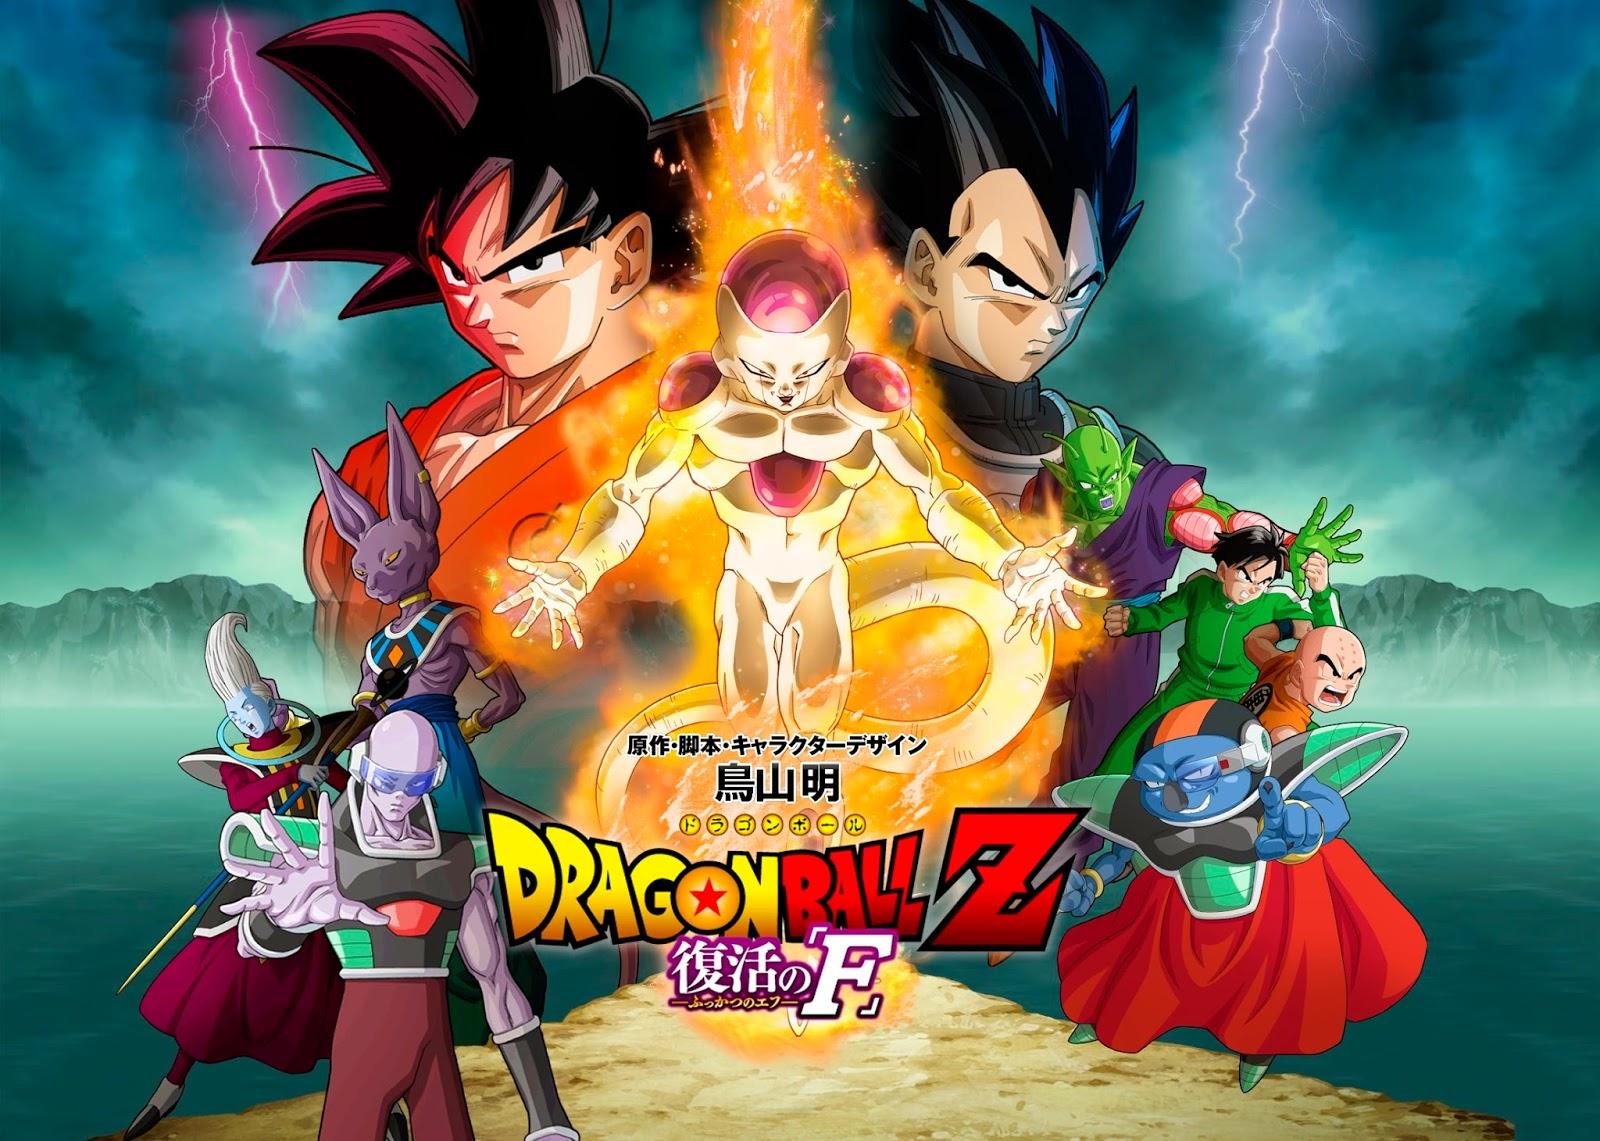 Dragon Ball Z Resurrection Of F Wallpapers Movie Hq Dragon Ball